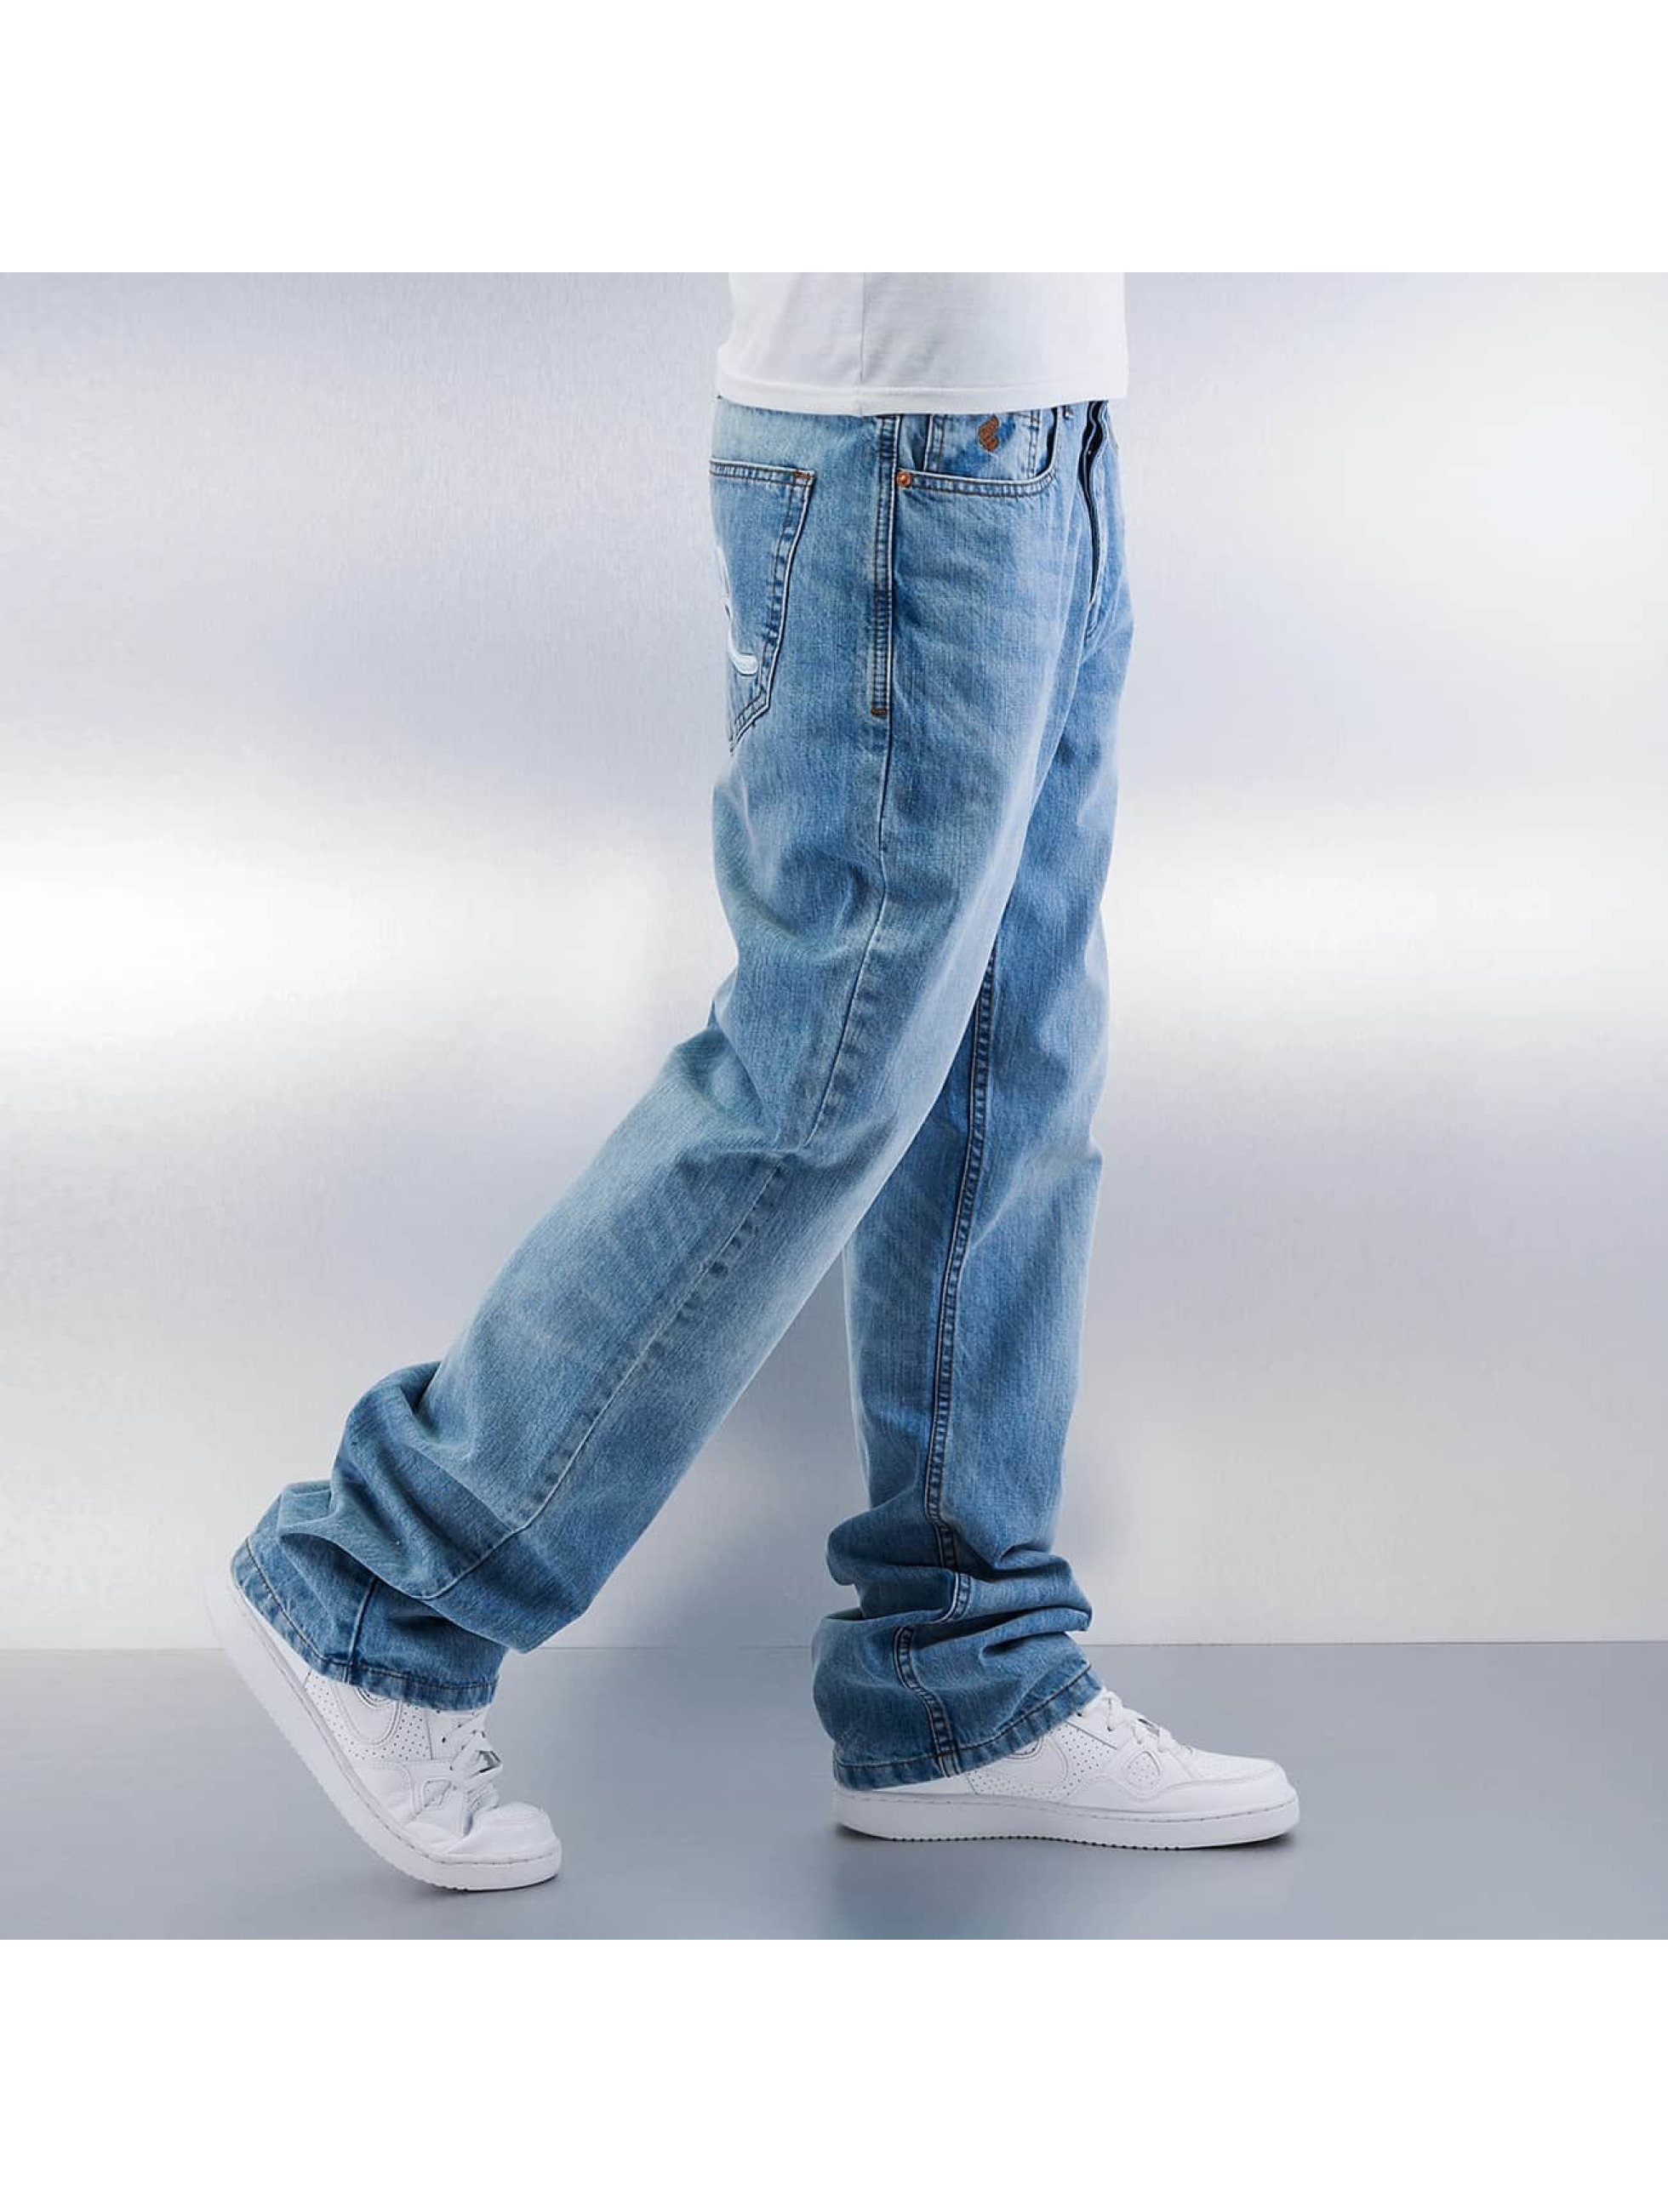 rocawear tap bleu homme jean large rocawear acheter pas. Black Bedroom Furniture Sets. Home Design Ideas